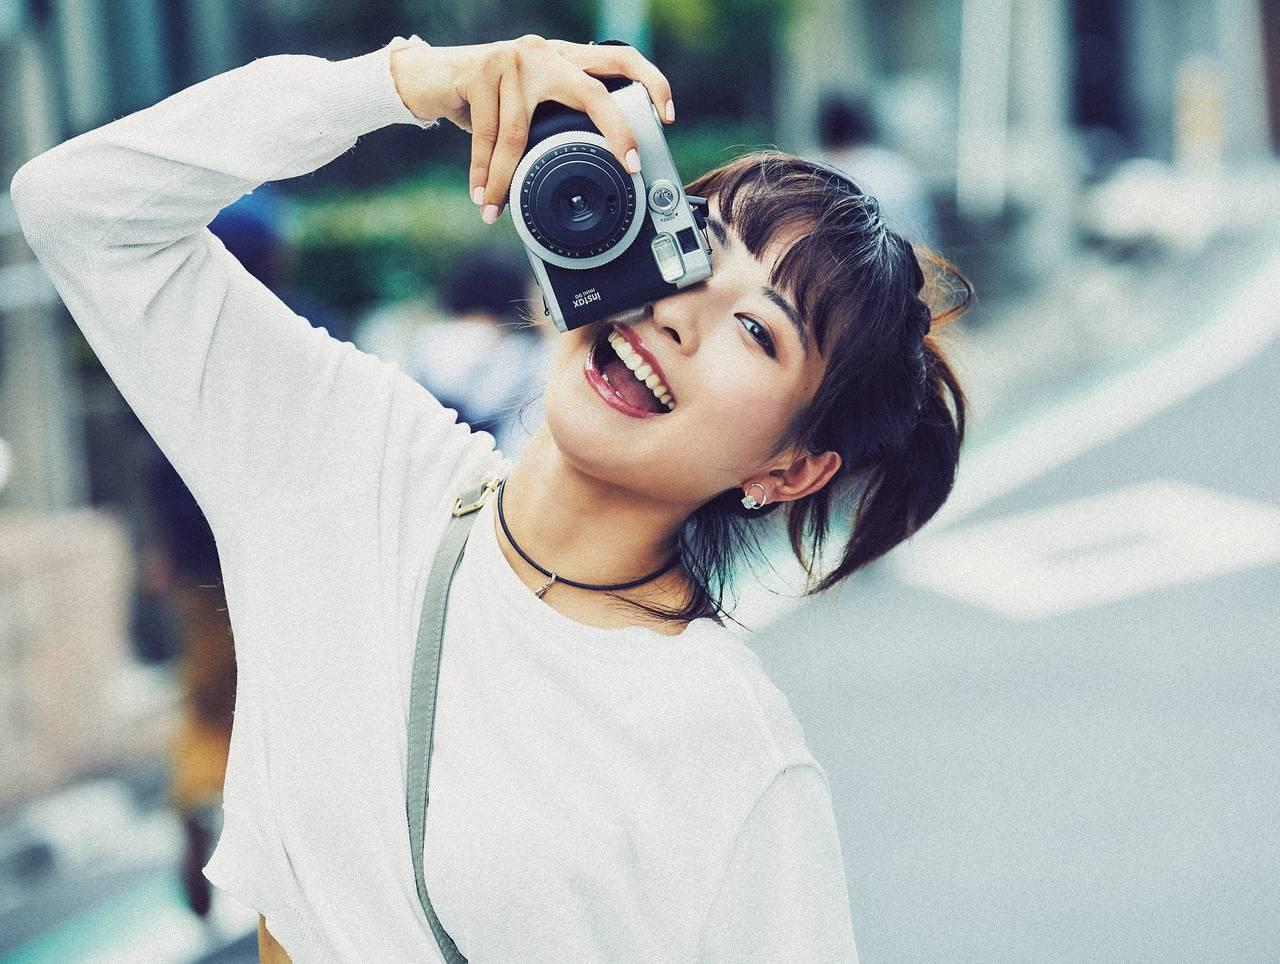 TikTokで話題の中国美女。バレンタインに大物俳優から逆告白された想定外の結果とは?